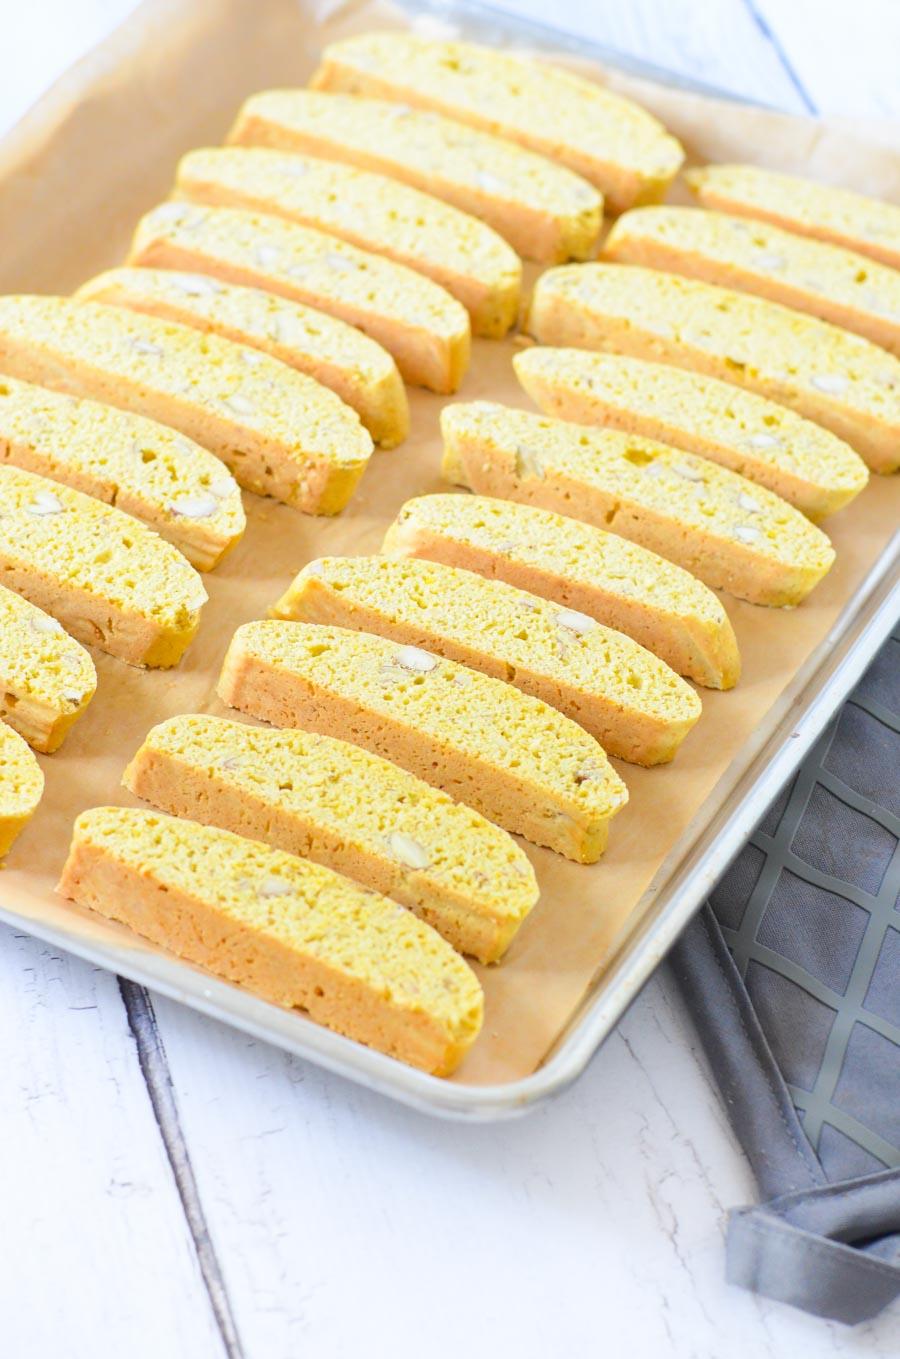 Easy Almond Biscotti with Lemon - Lowfat